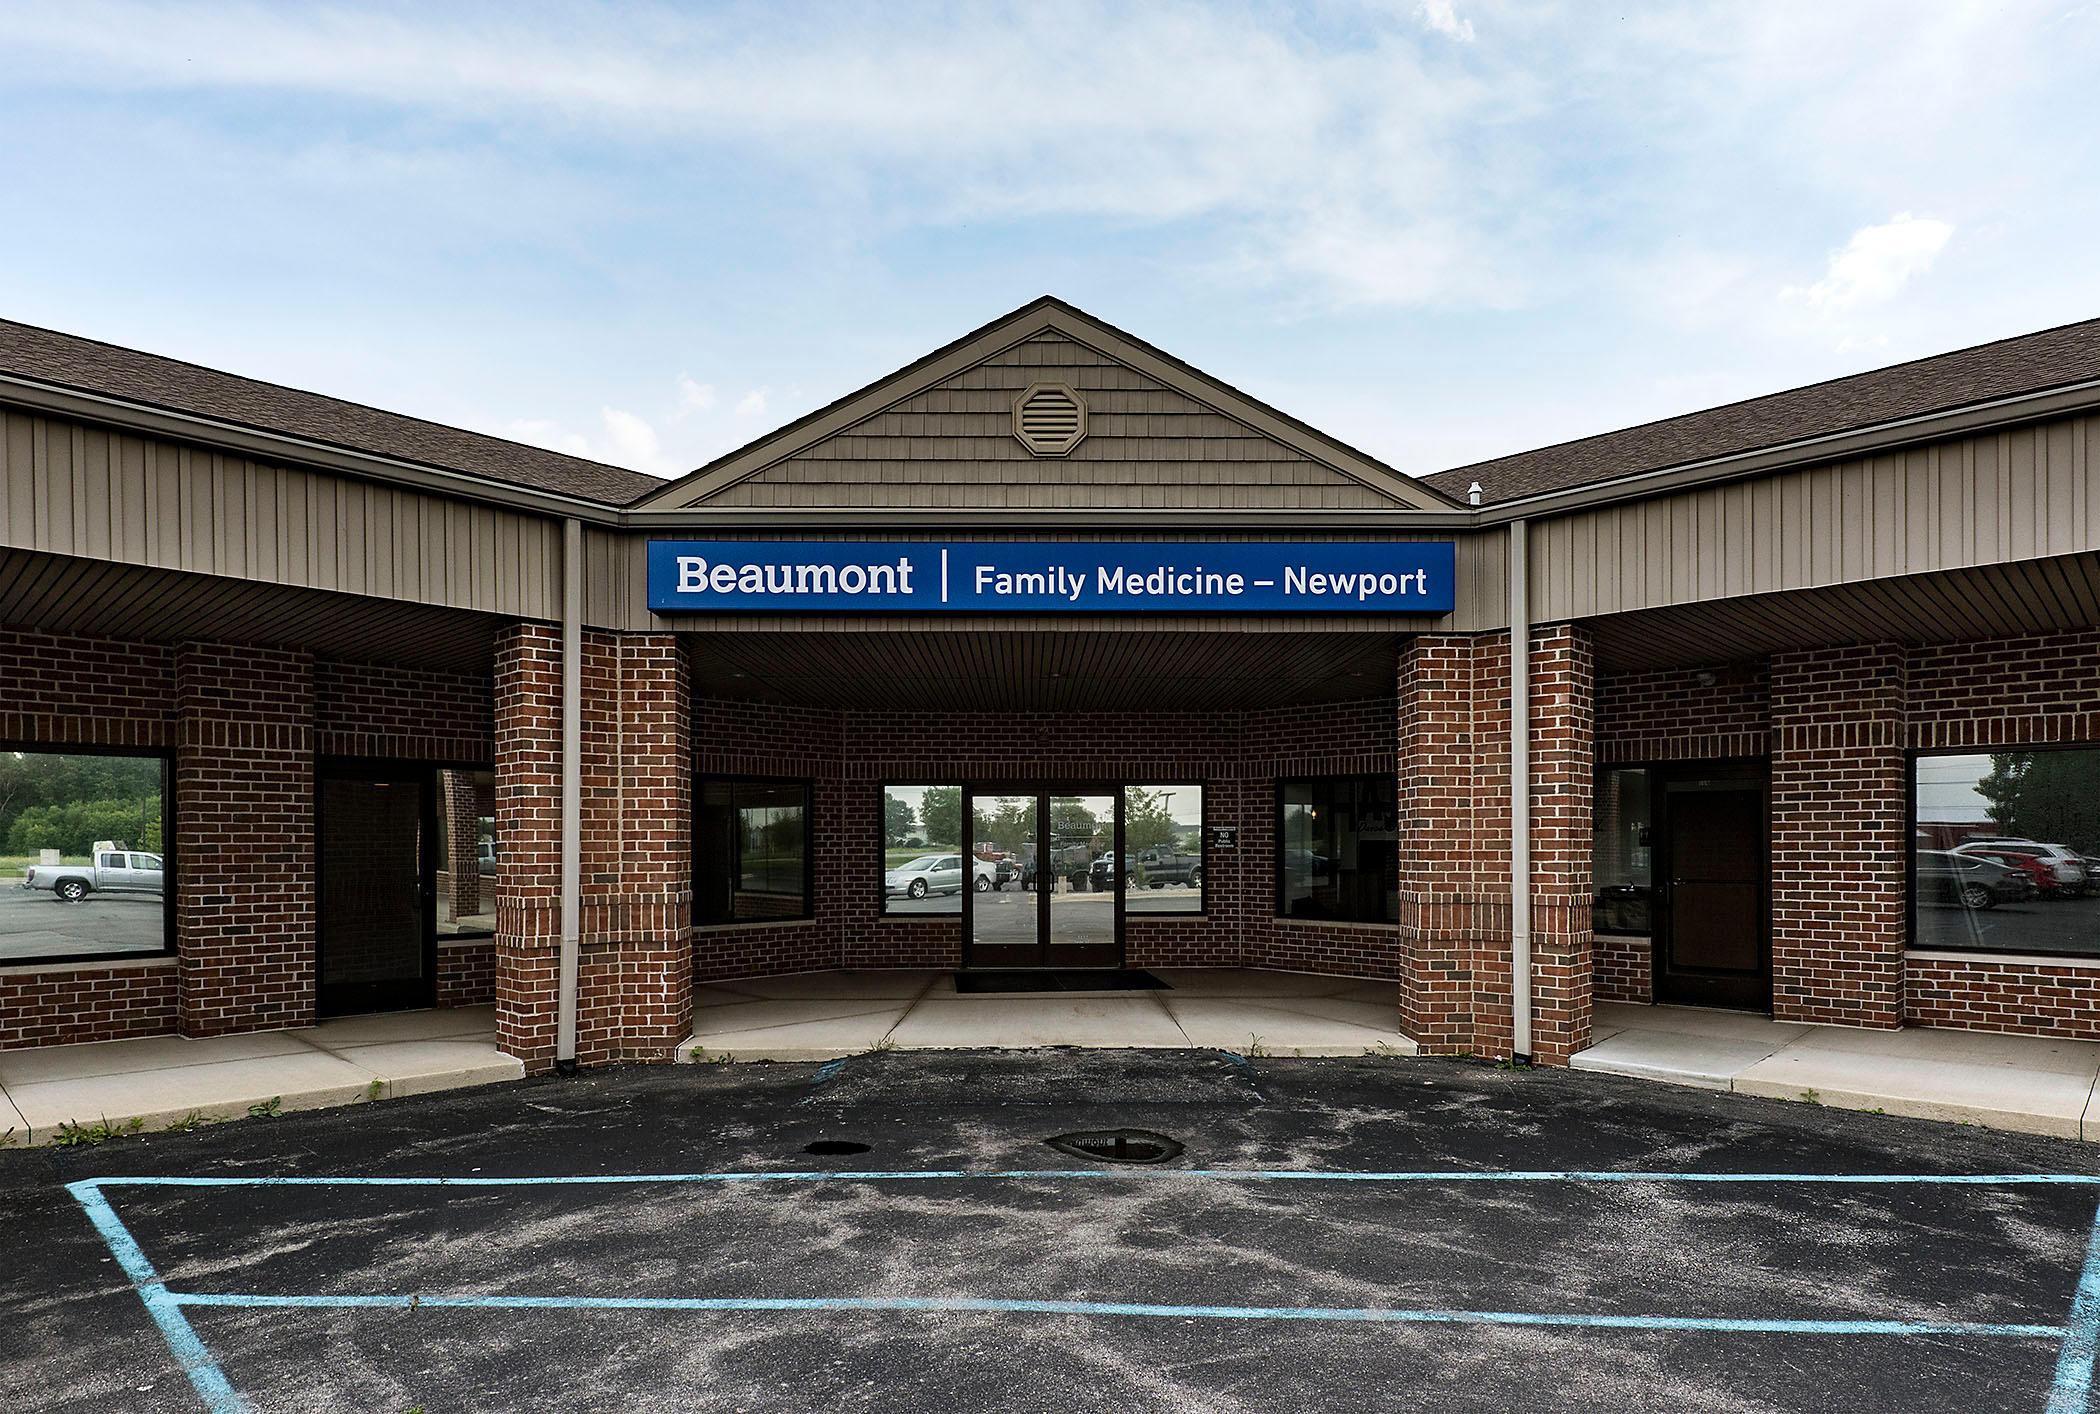 Beaumont Family Medicine - Newport